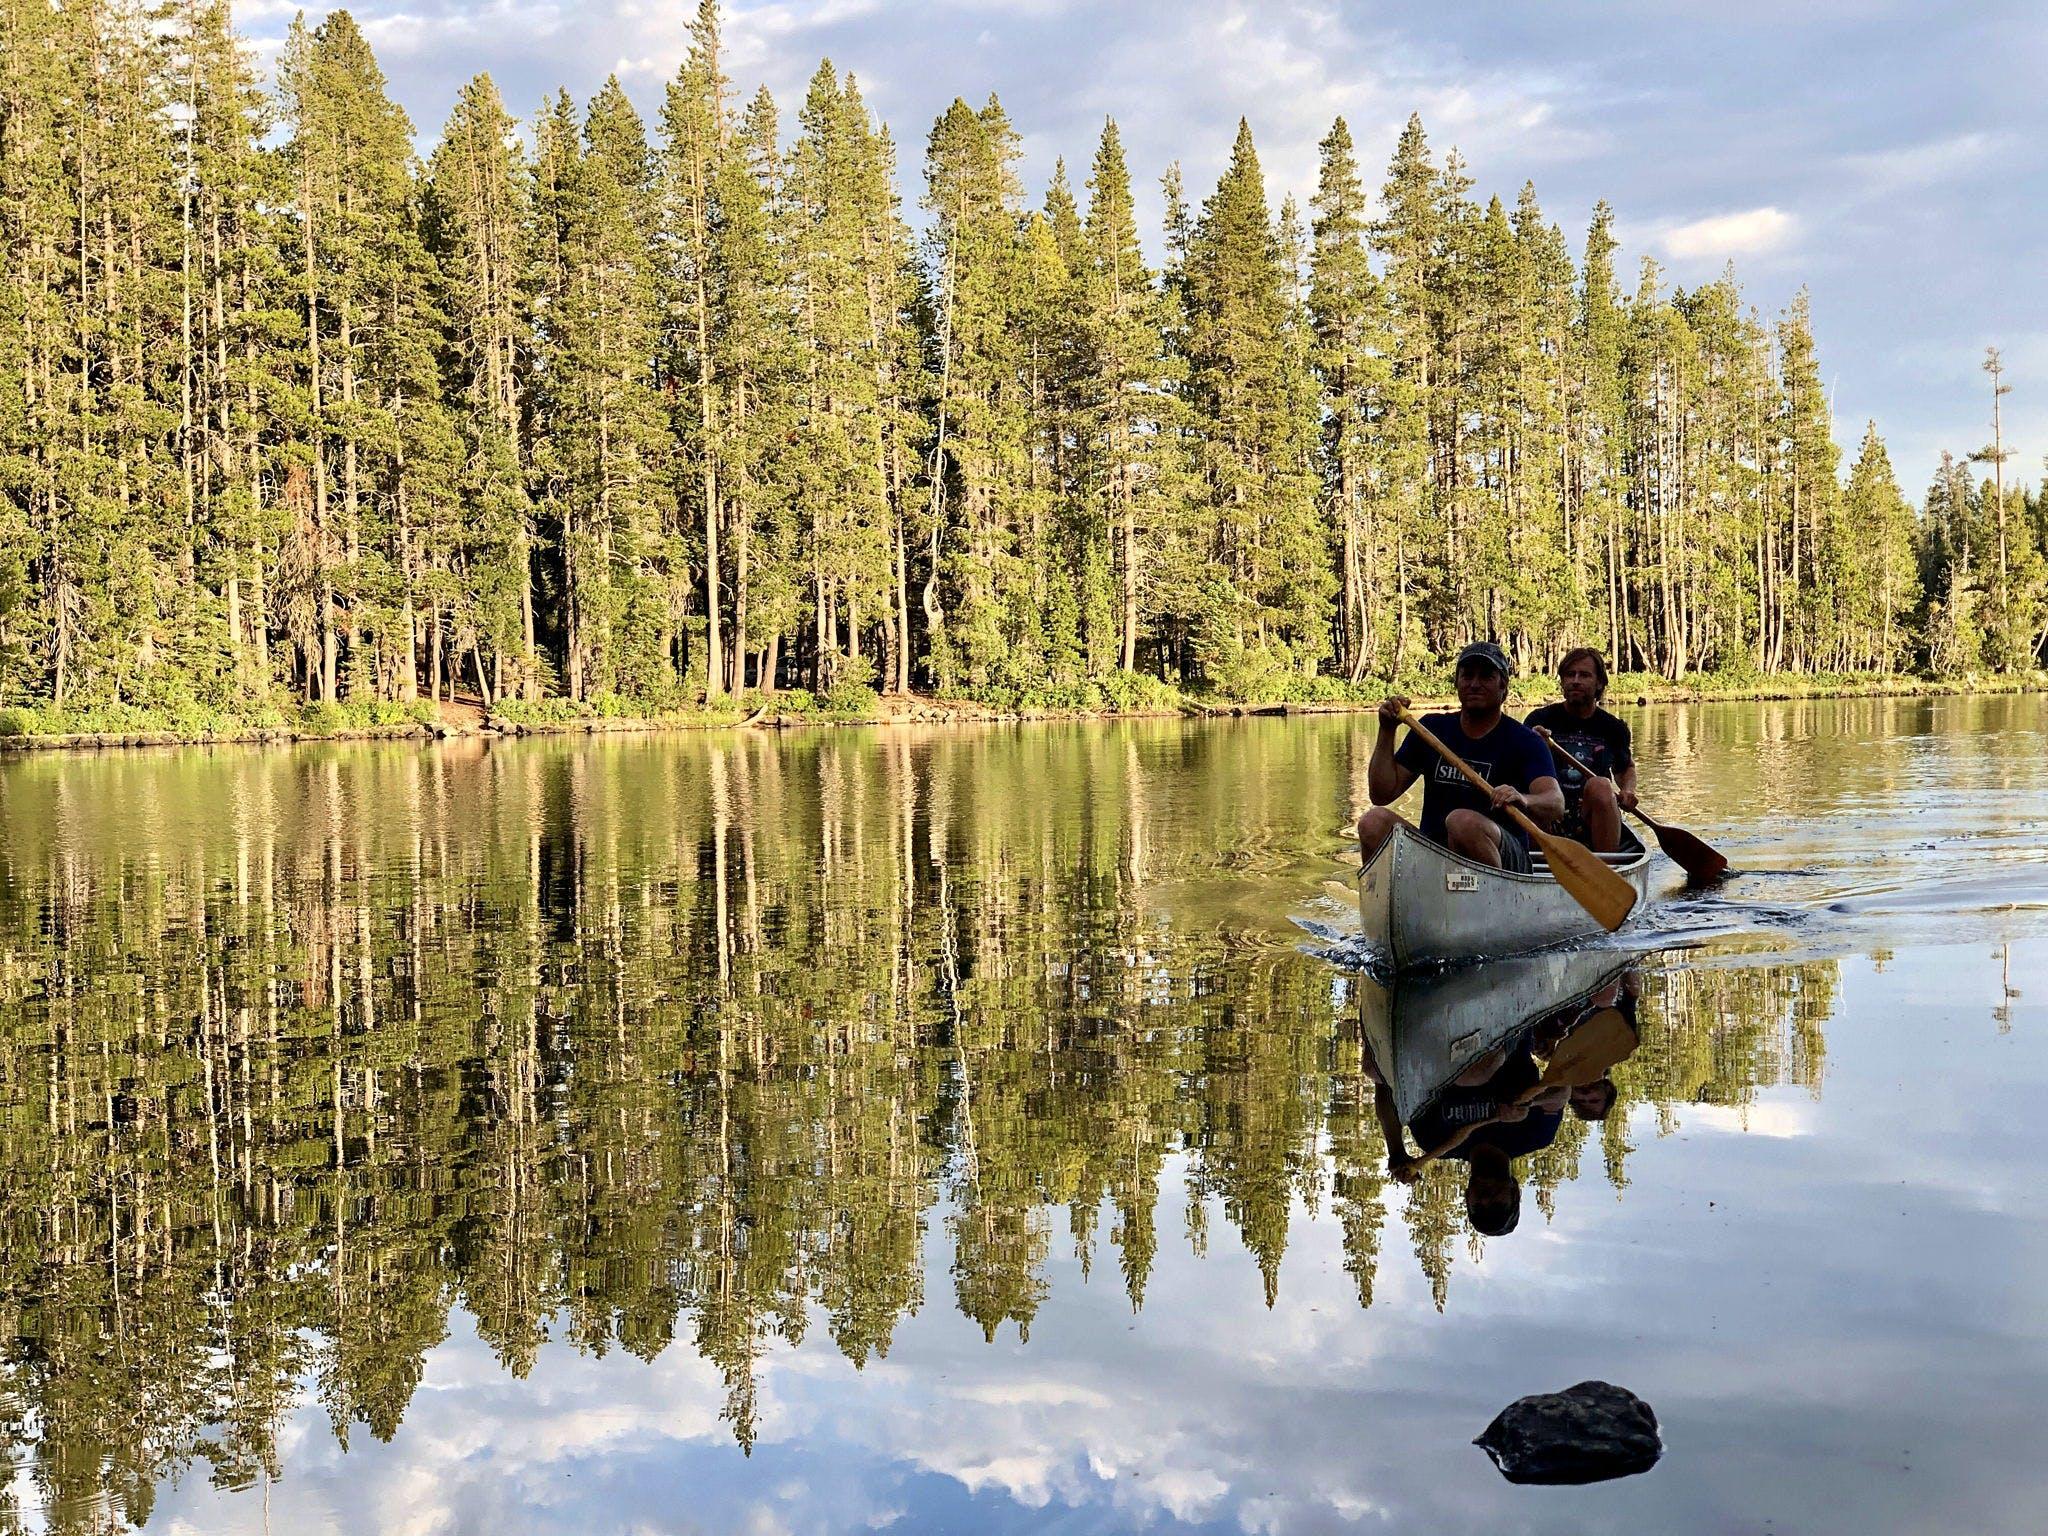 Camp at Goose Lake in the Lakes Basin